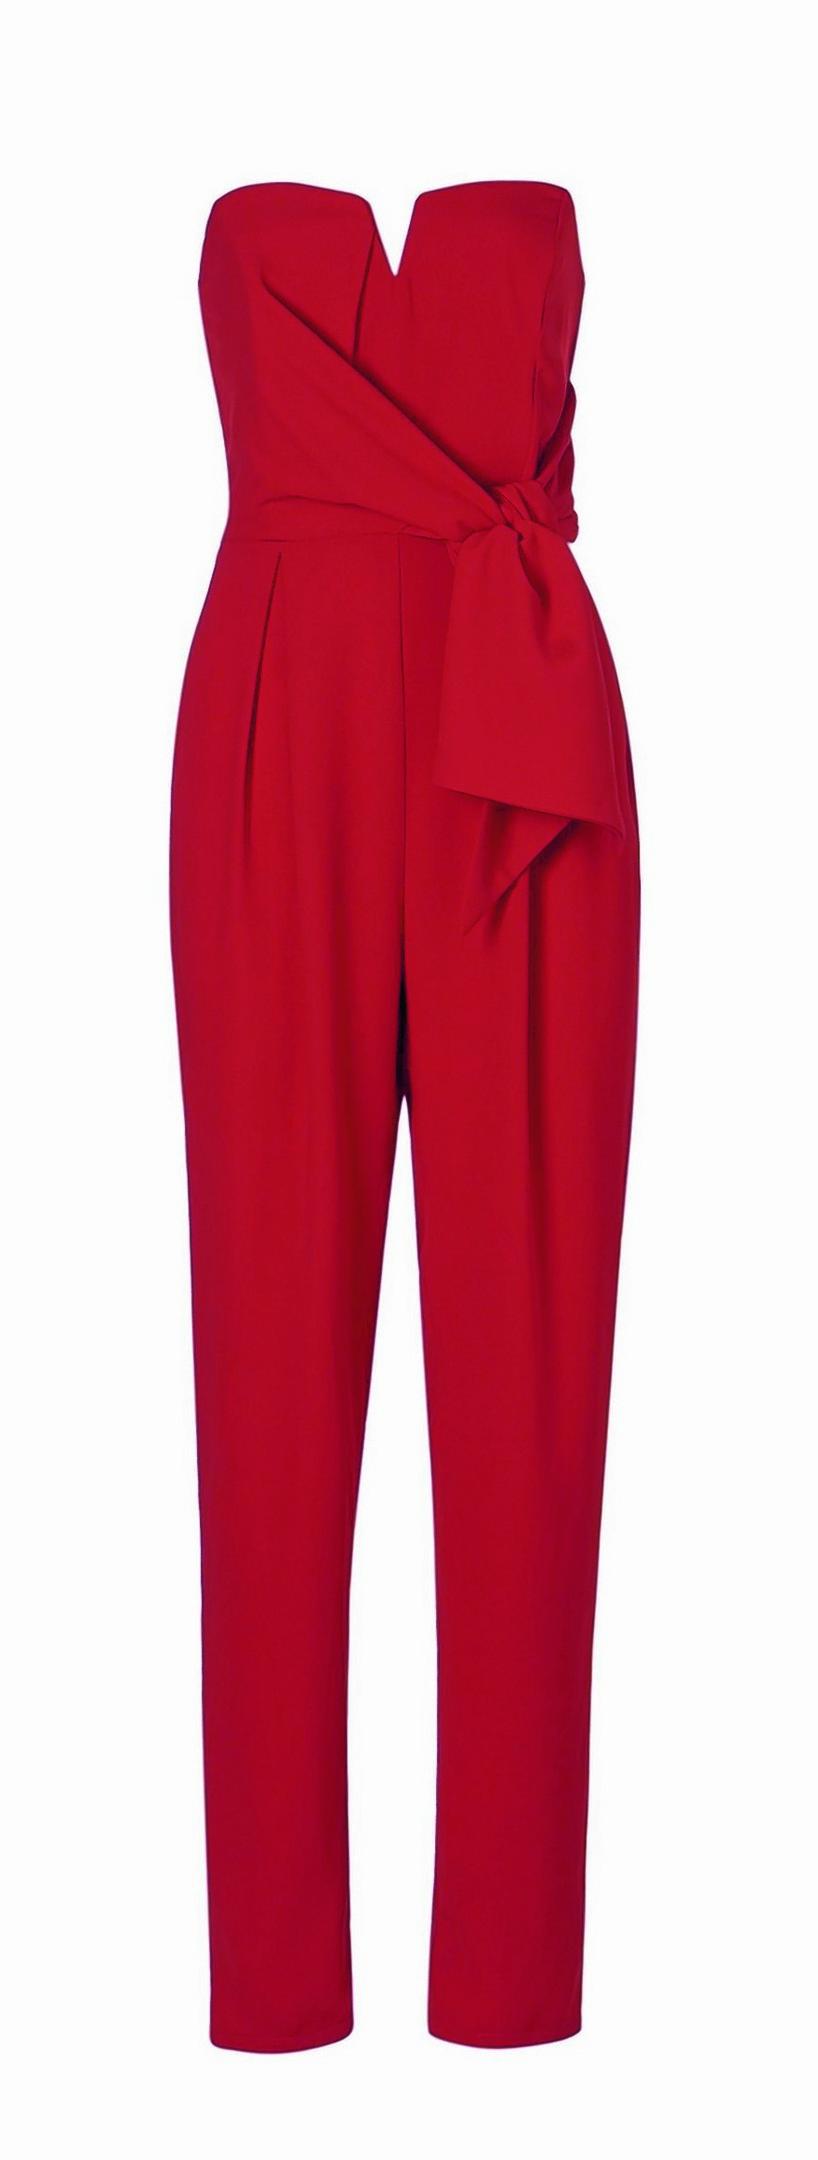 Asda red jumpsuit, £20